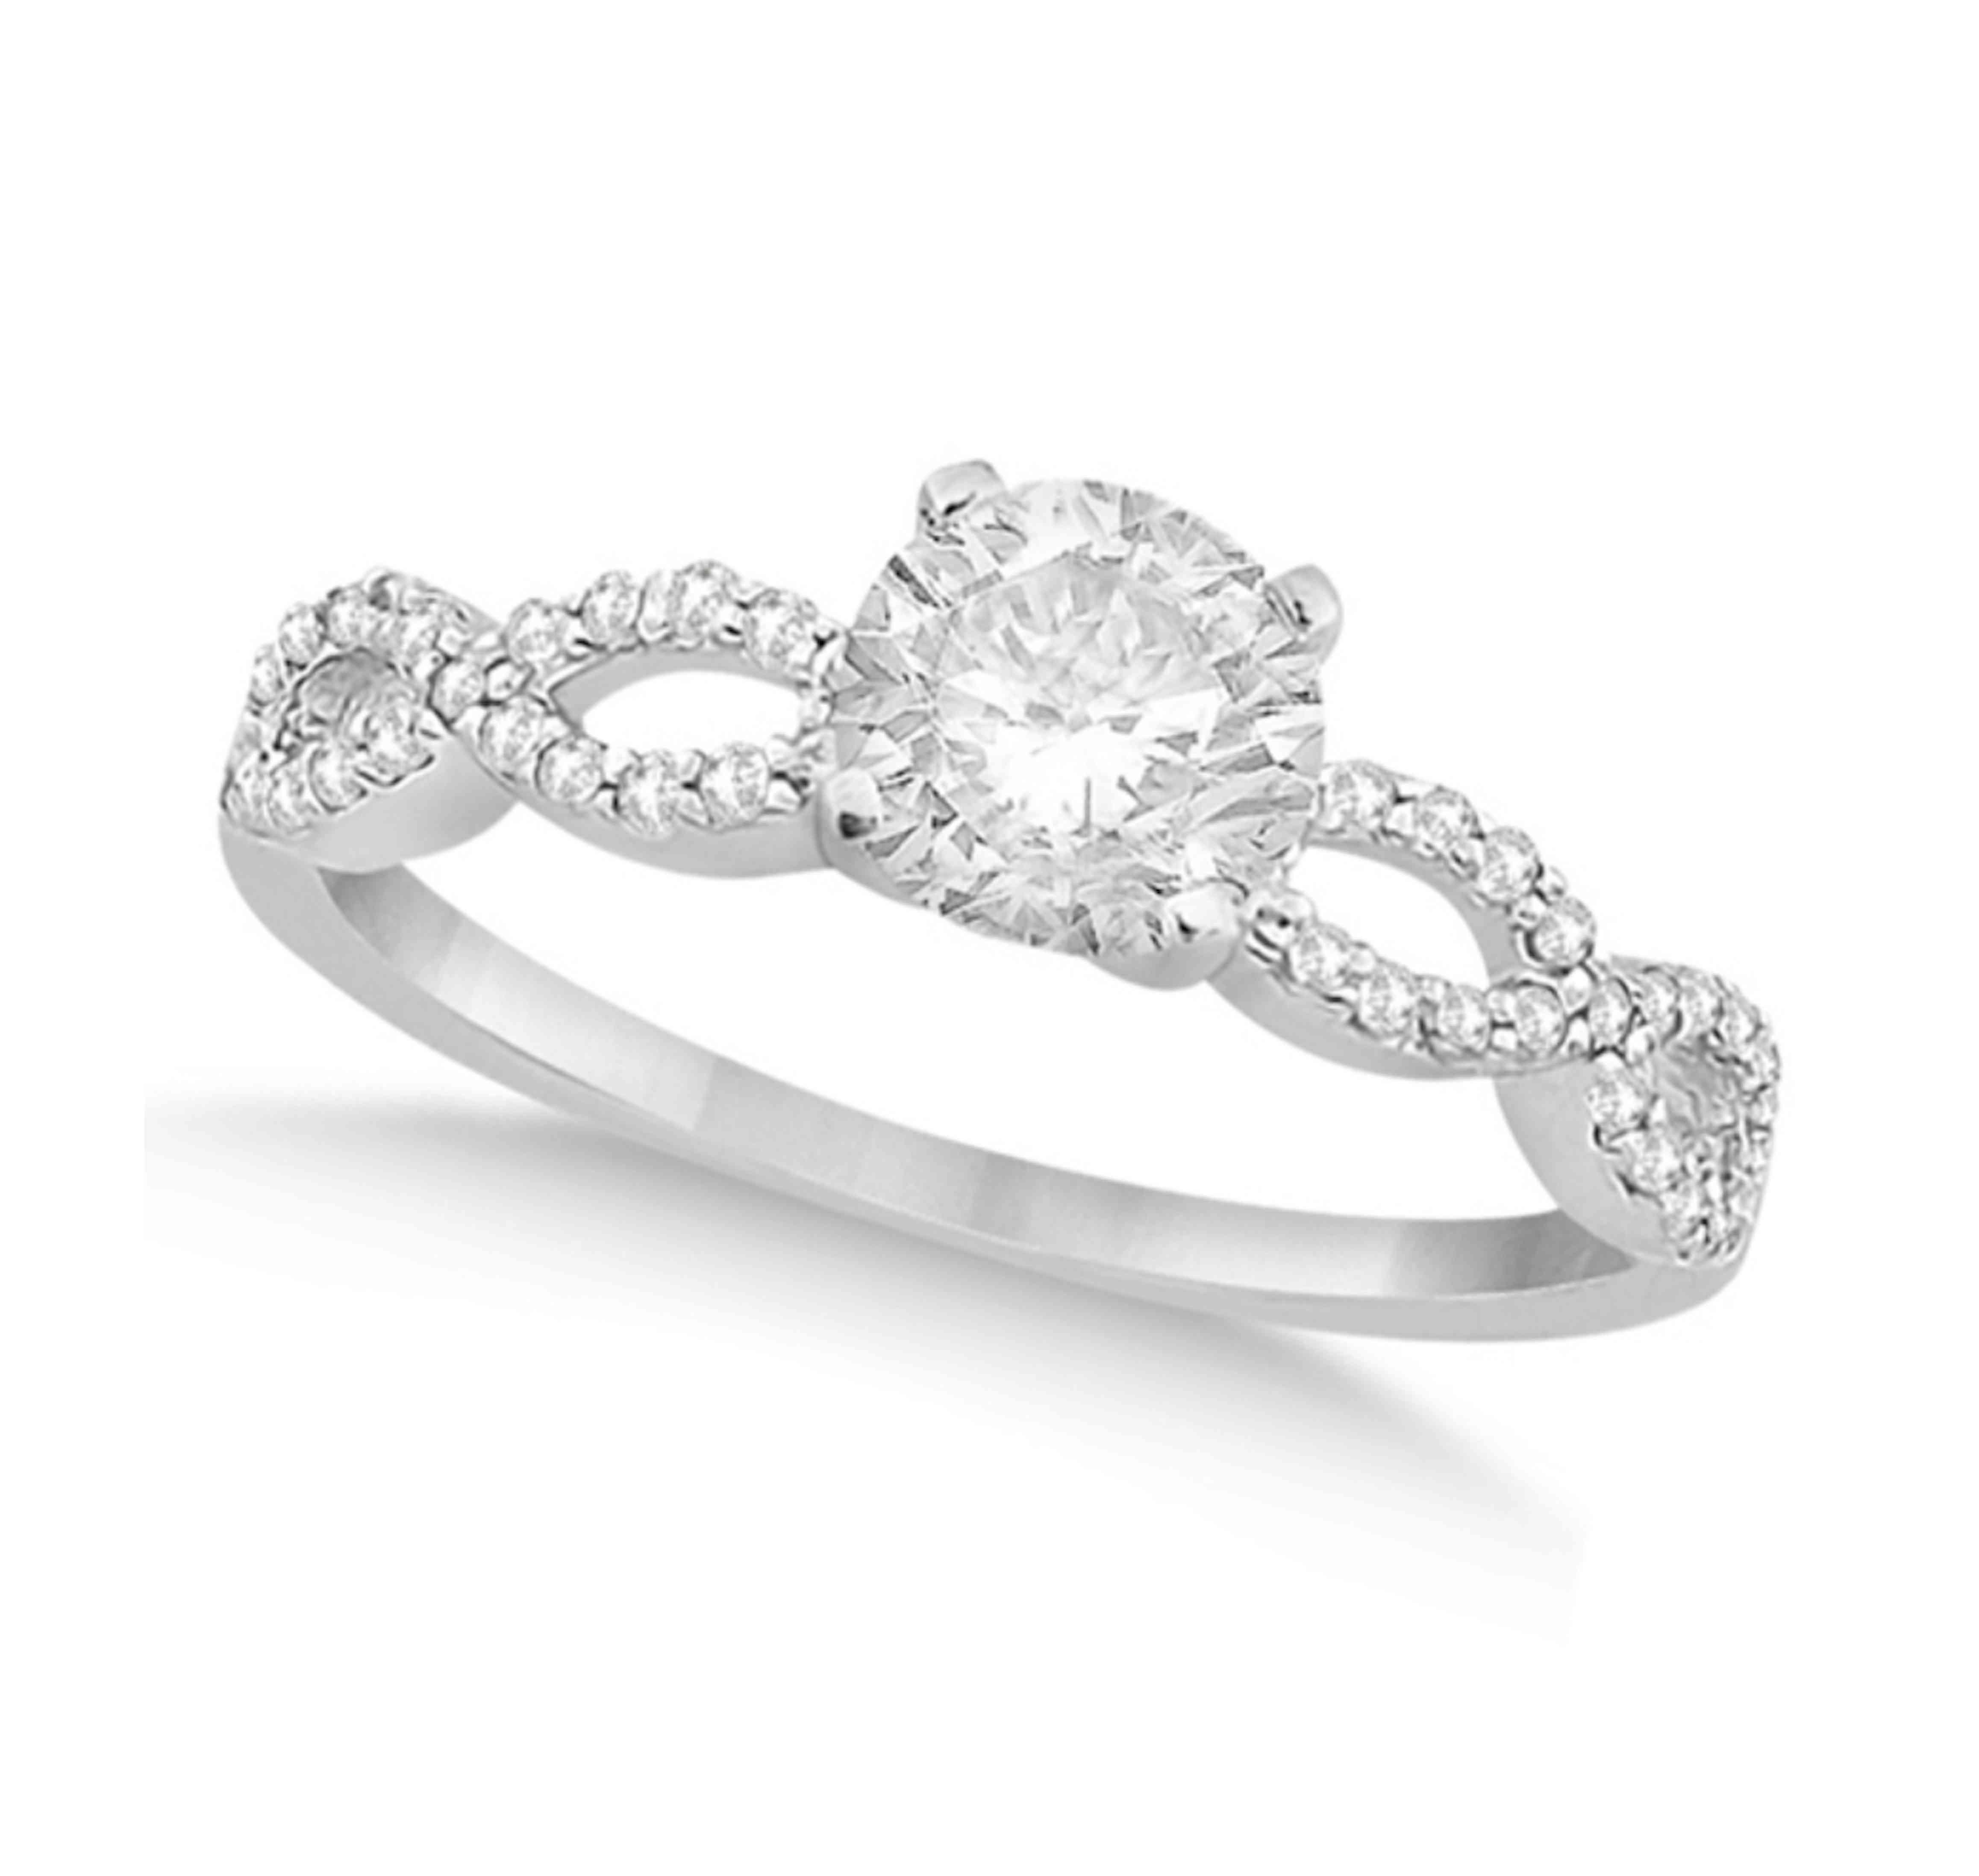 Allurez Twisted Infinity Round Diamond Engagement Ring